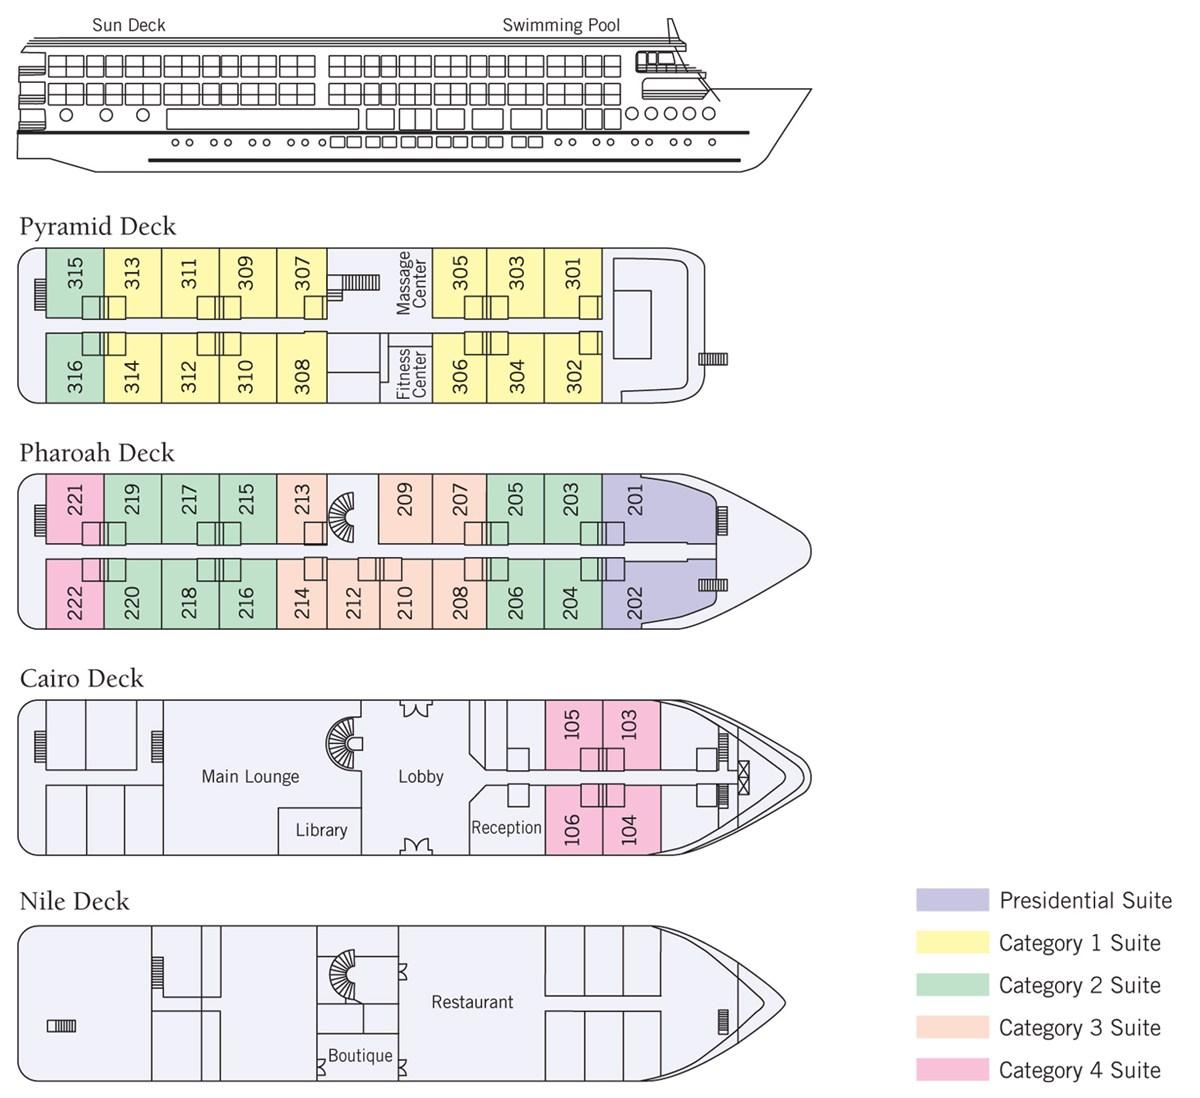 River Tosca Pin Satellite Diagram On Pinterest Deck Plan